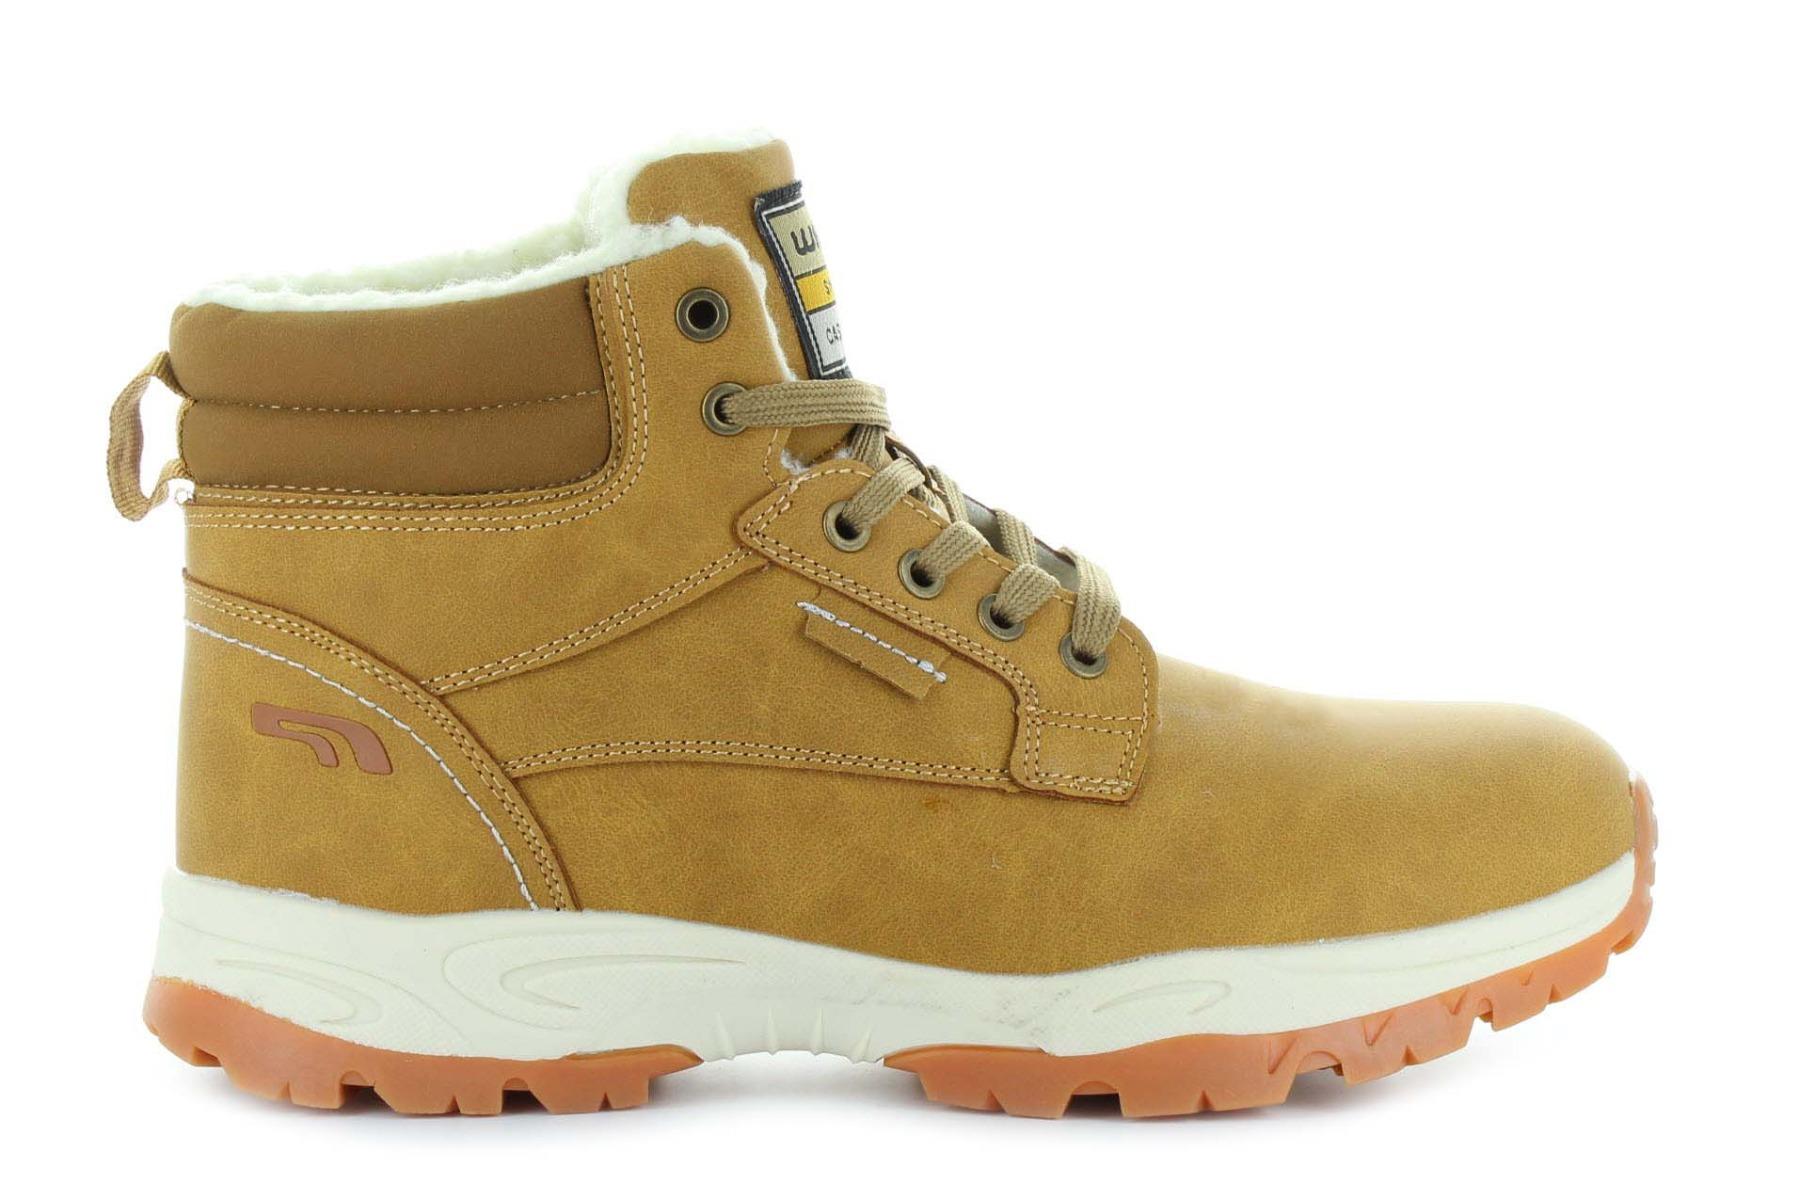 WinkEco Wink férfi cipő GLAMI.hu